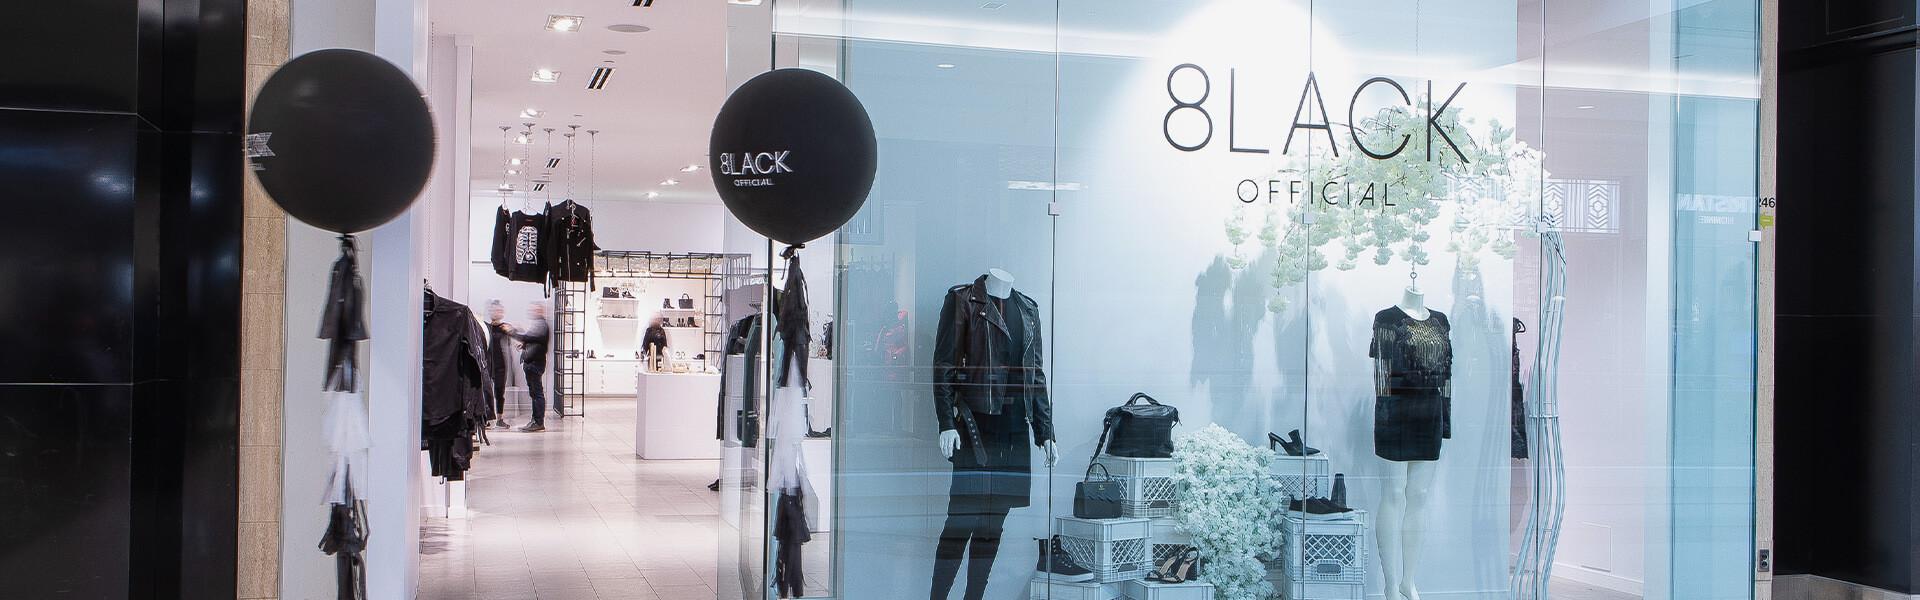 8lack Official - Rockland